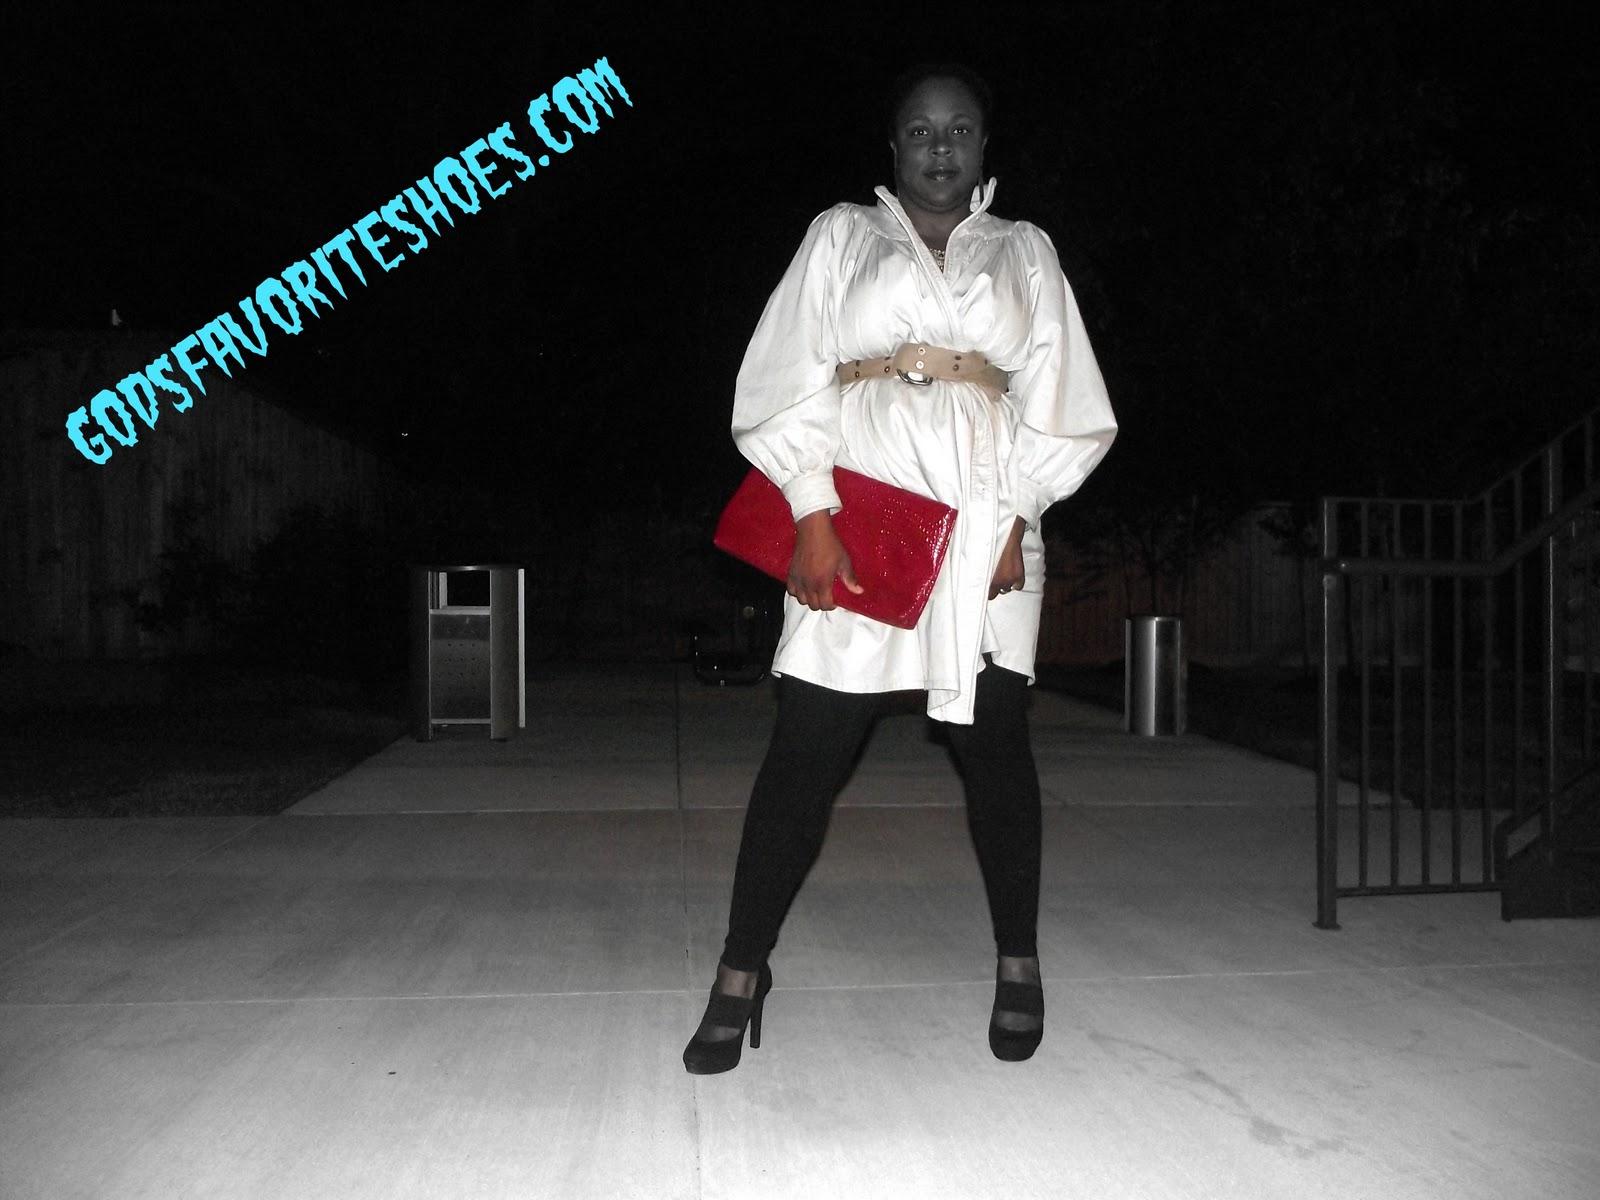 http://2.bp.blogspot.com/_d362dQm-IGU/TNOKTl5NwGI/AAAAAAAADLg/bt6gHztdBB4/s1600/Gfs.jpg